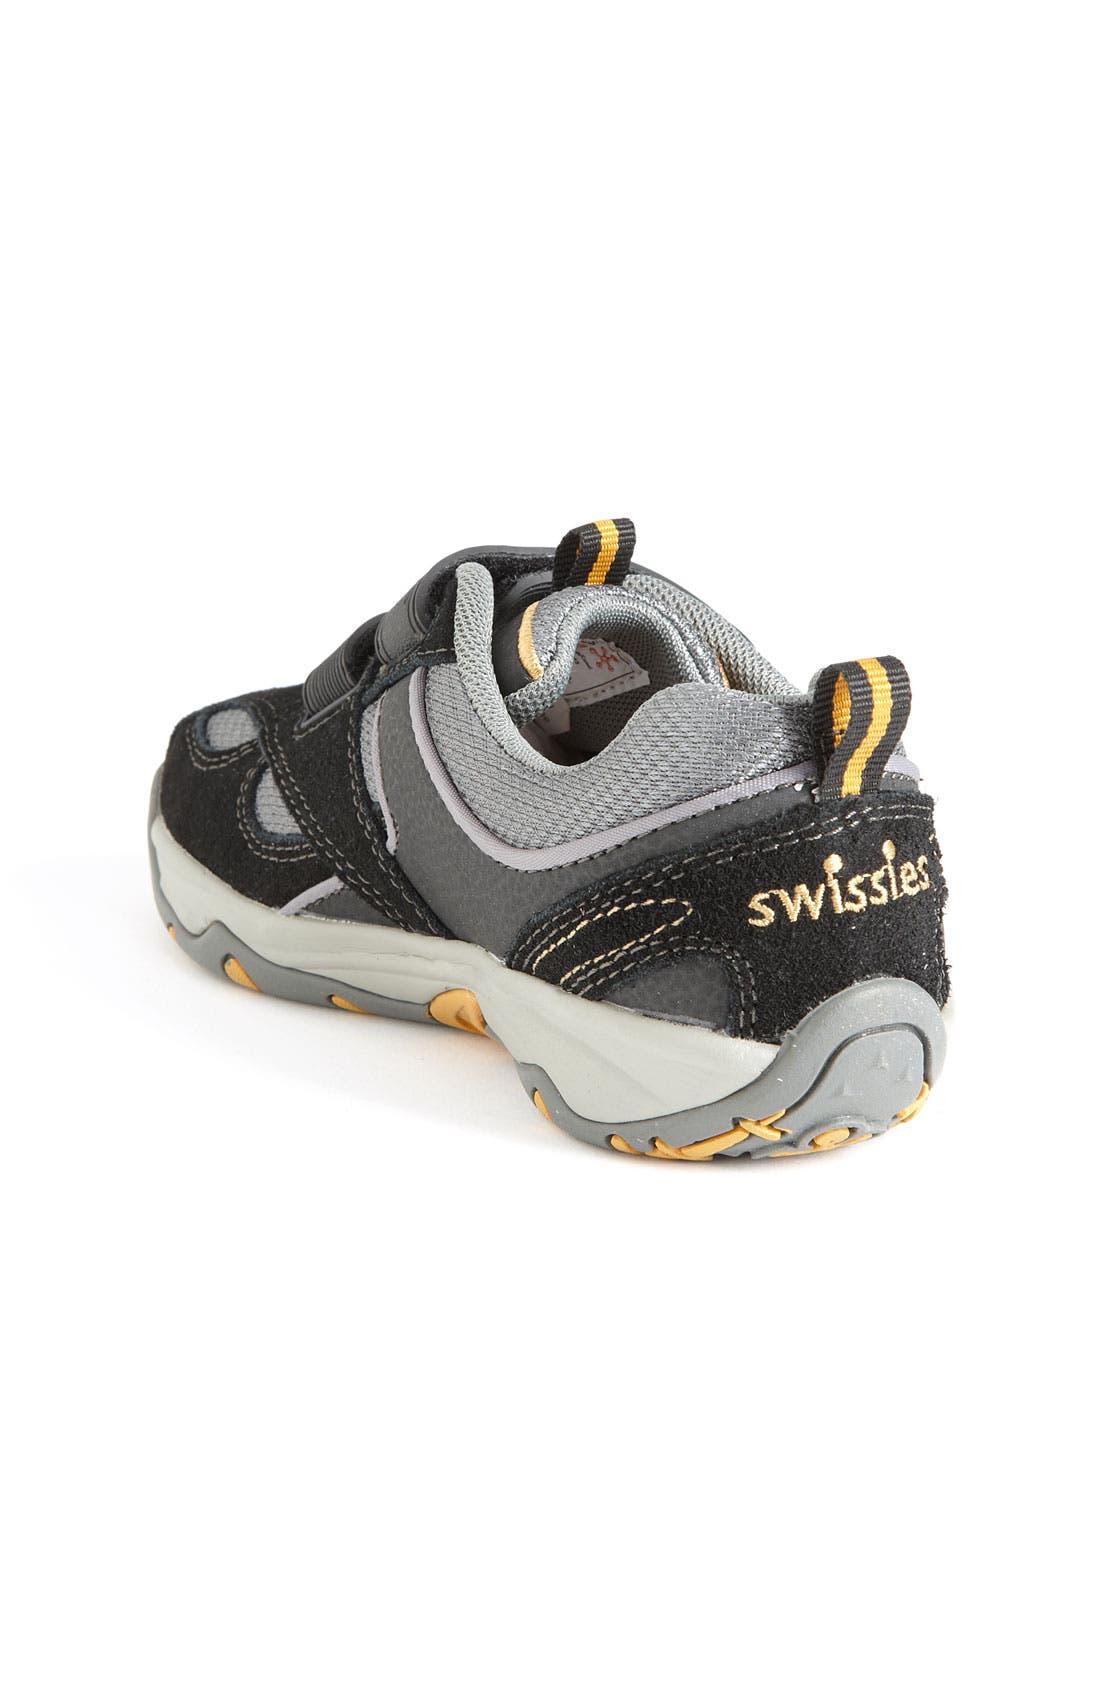 Alternate Image 2  - Swissies 'Mark' Athletic Sneaker (Toddler, Little Kid & Big Kid)